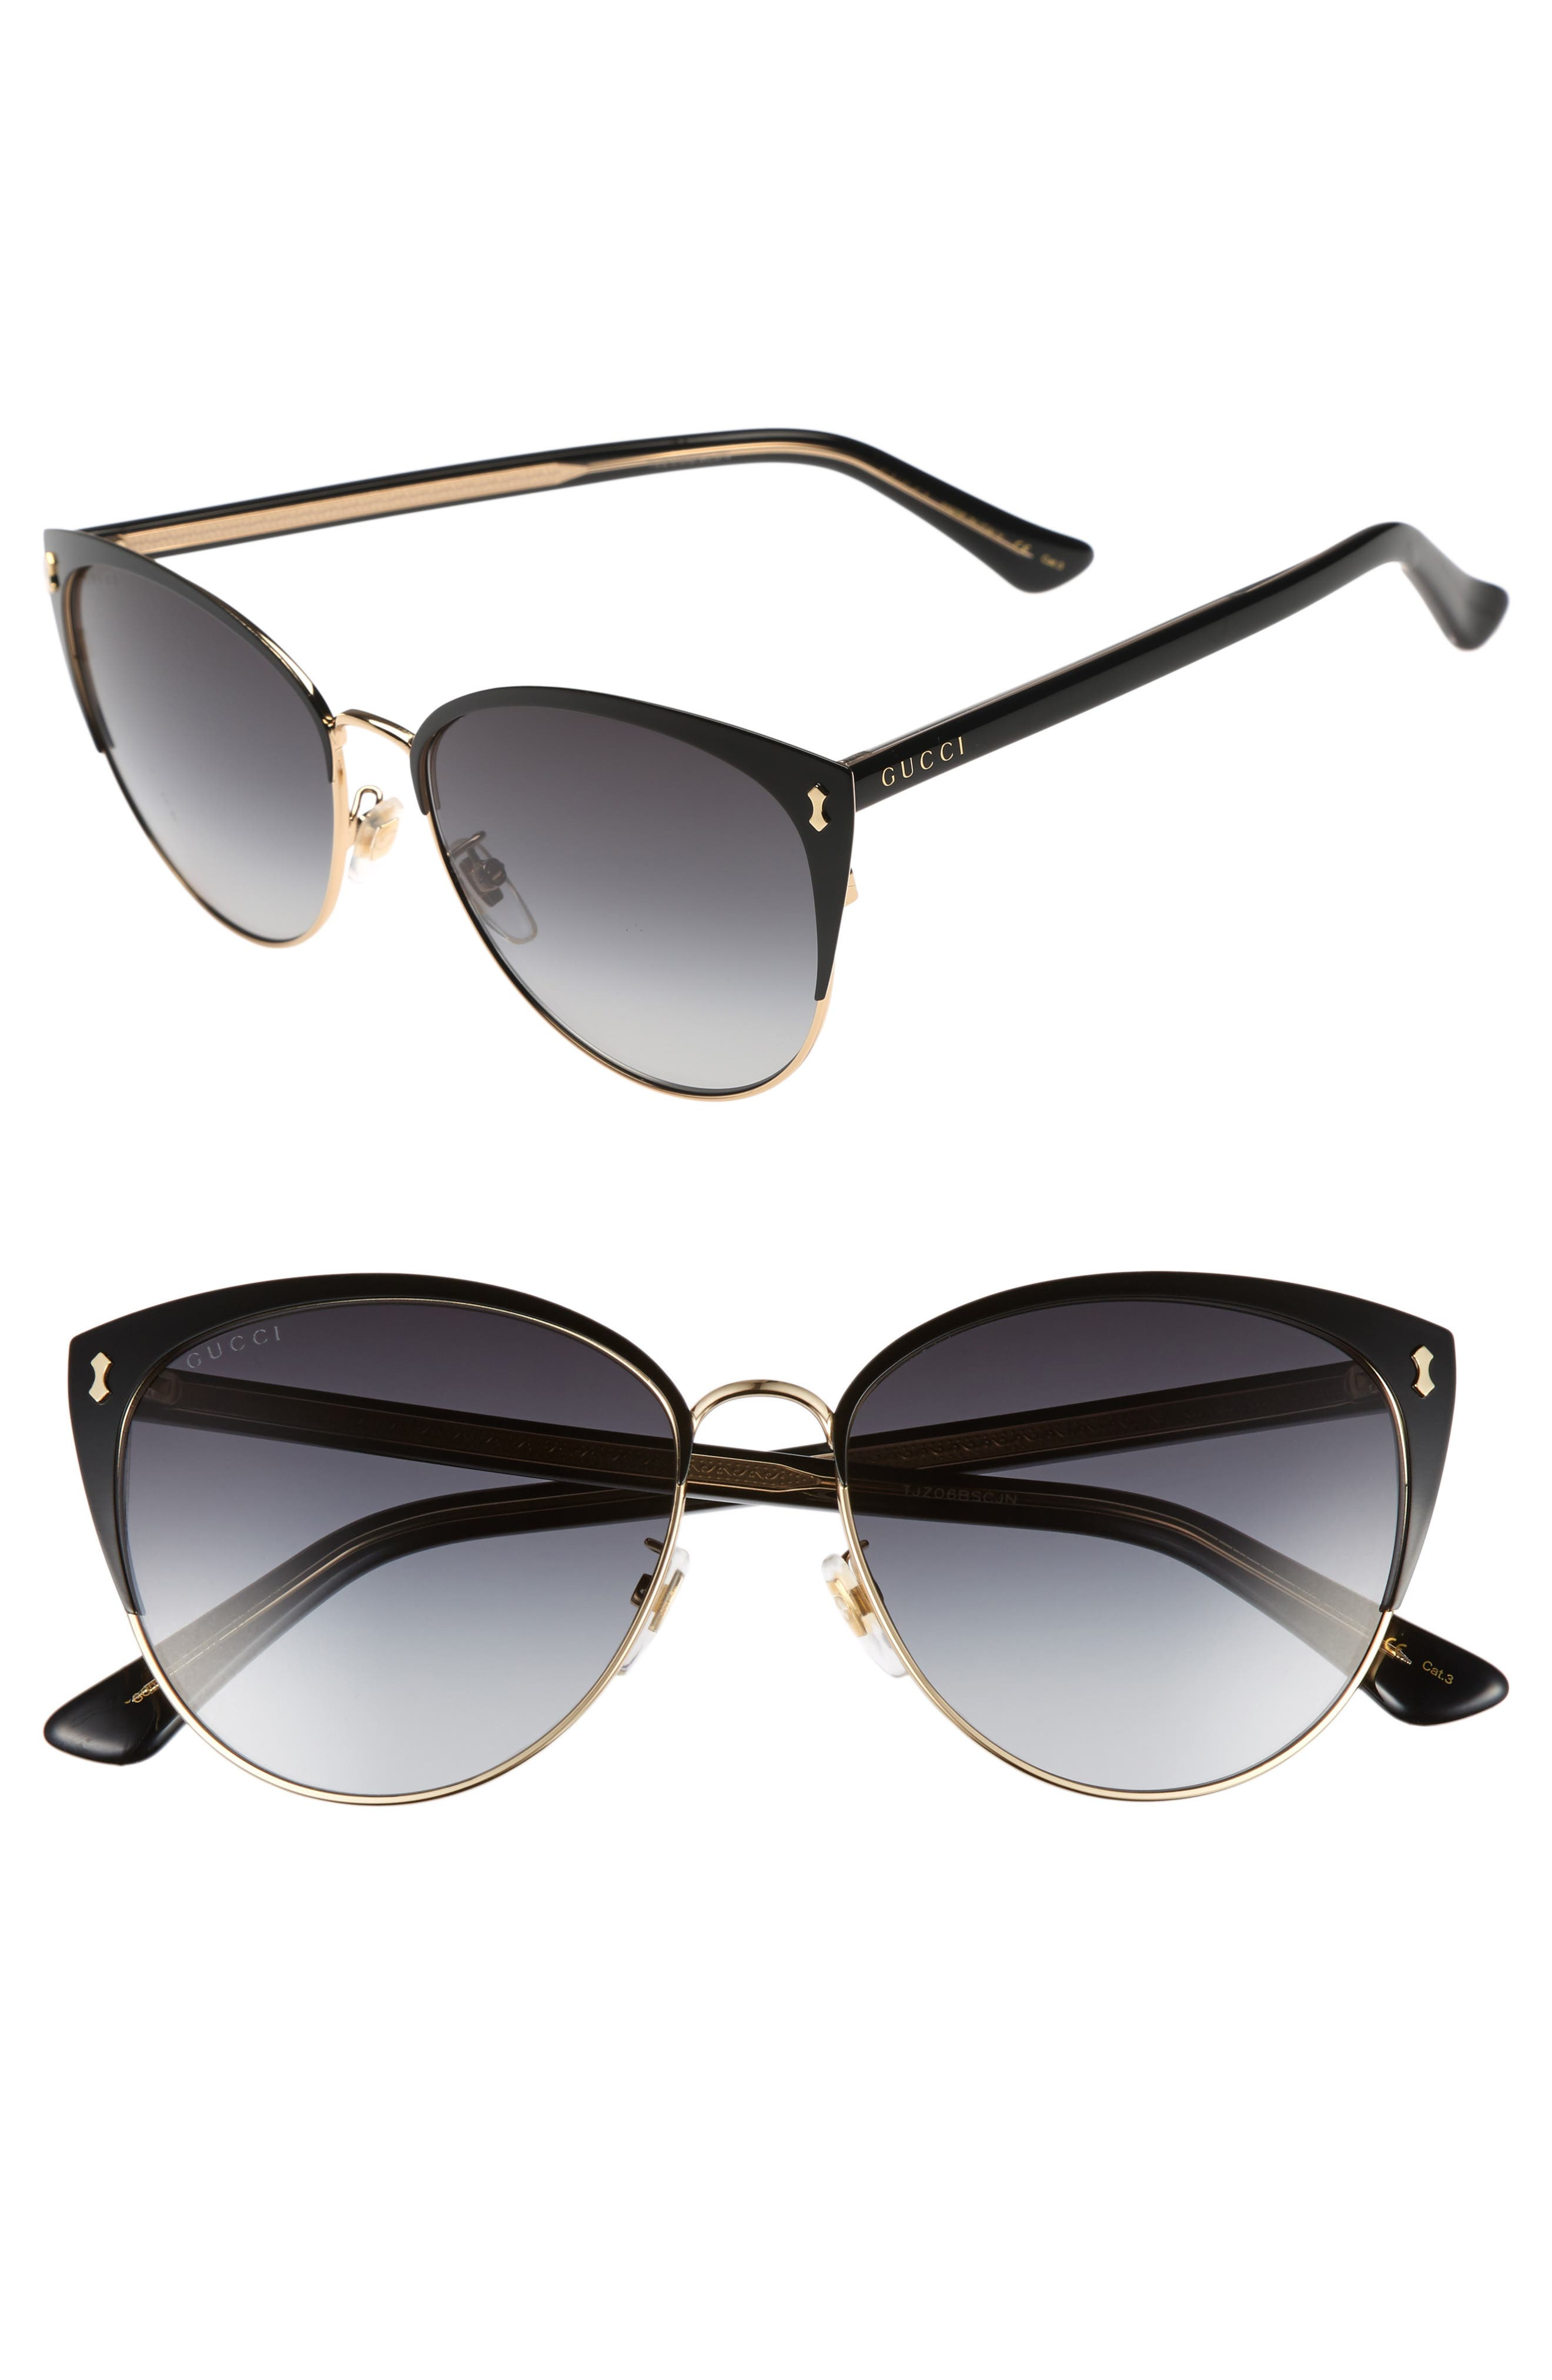 Gucci 5m Cat Eye Sunglasses - Black